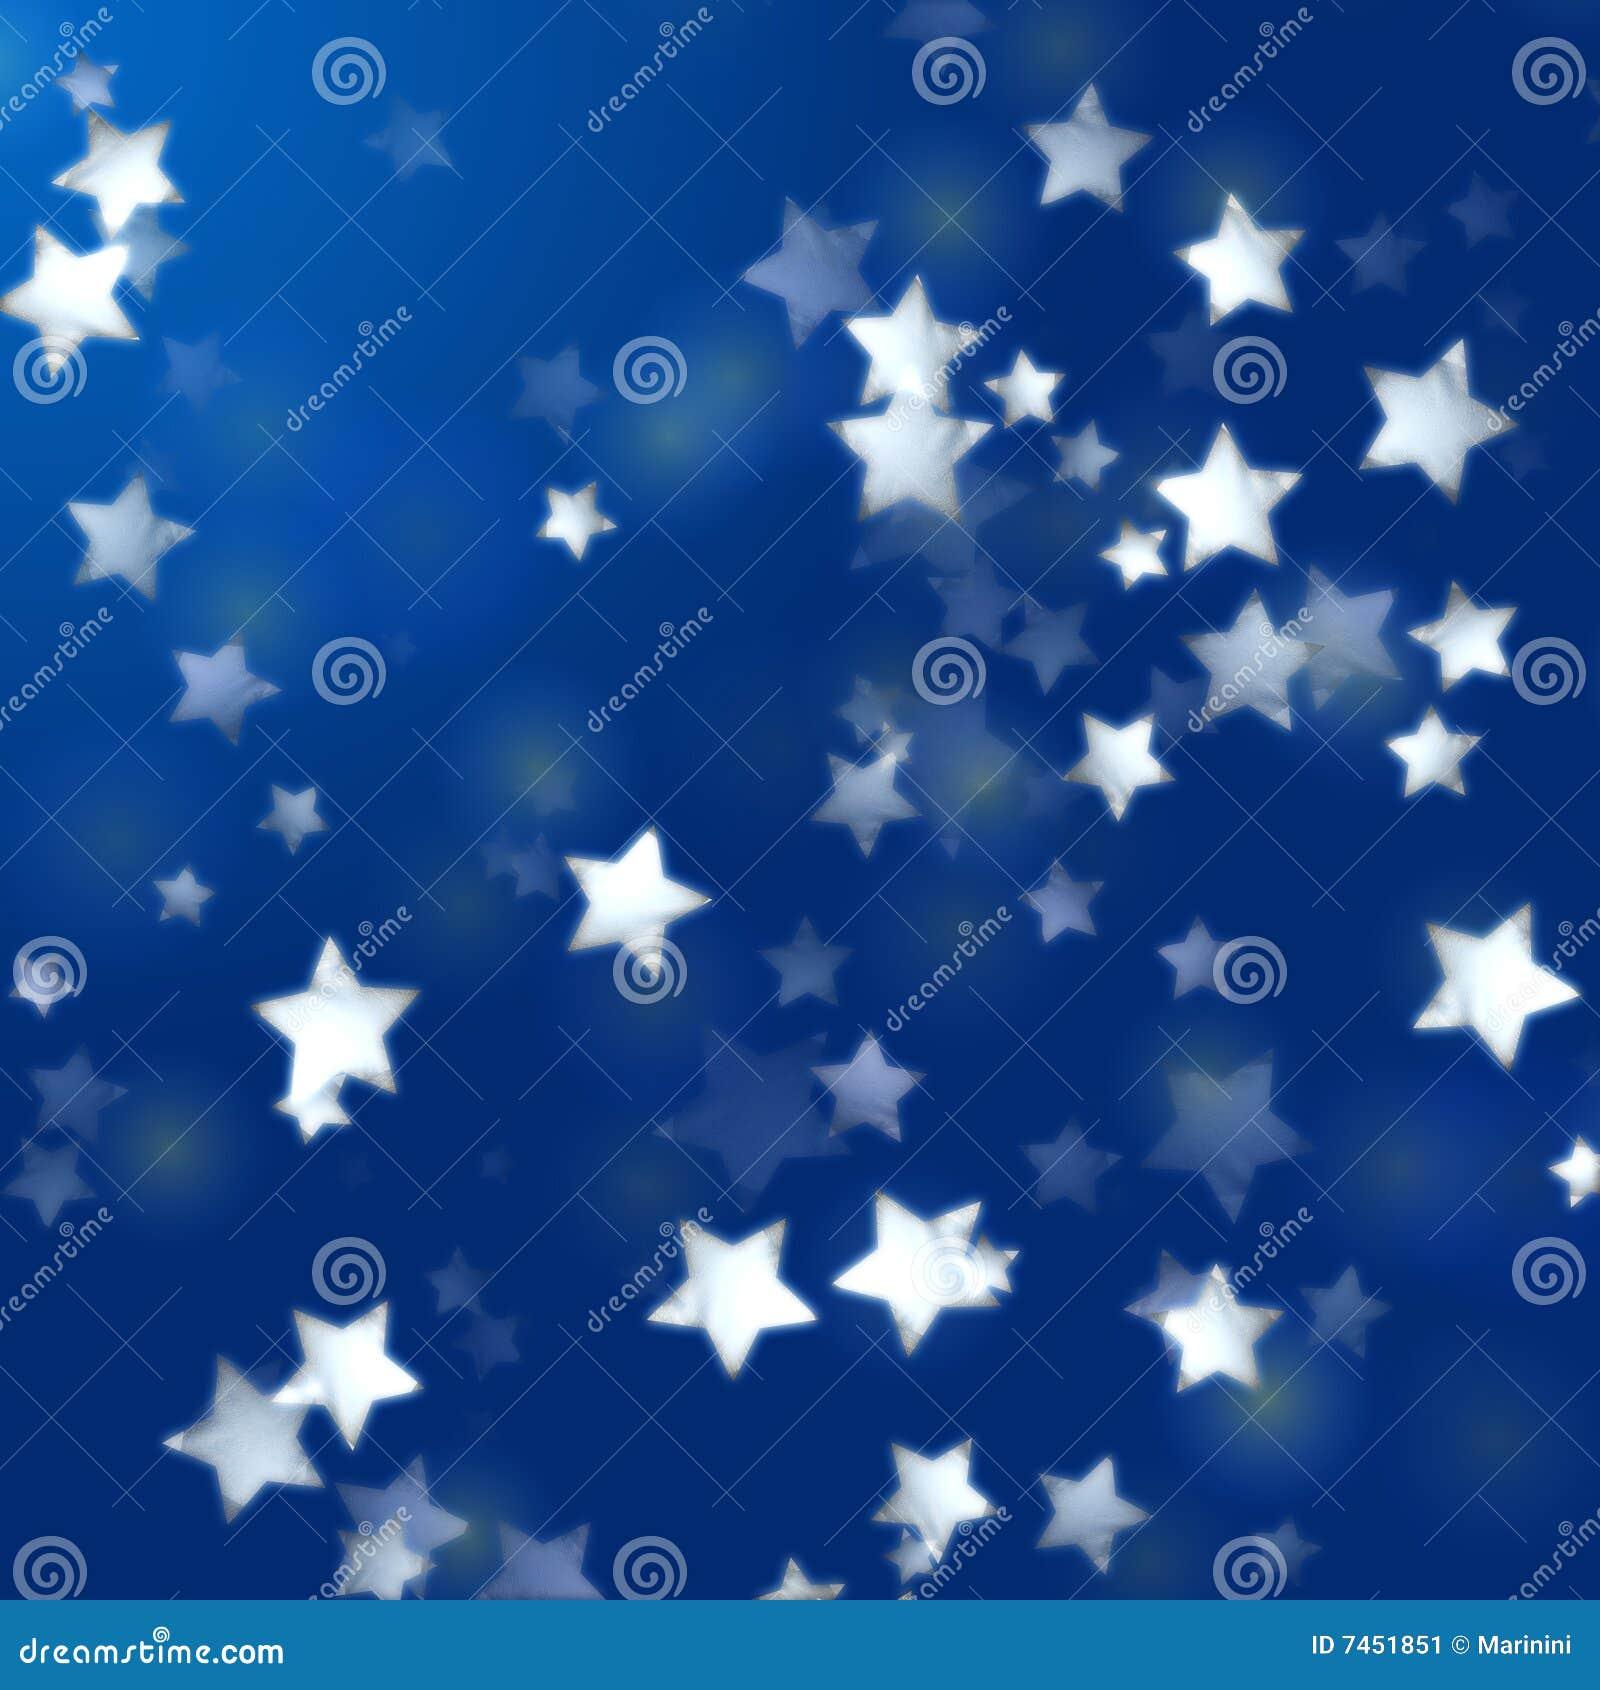 navy blue iphone wallpaper